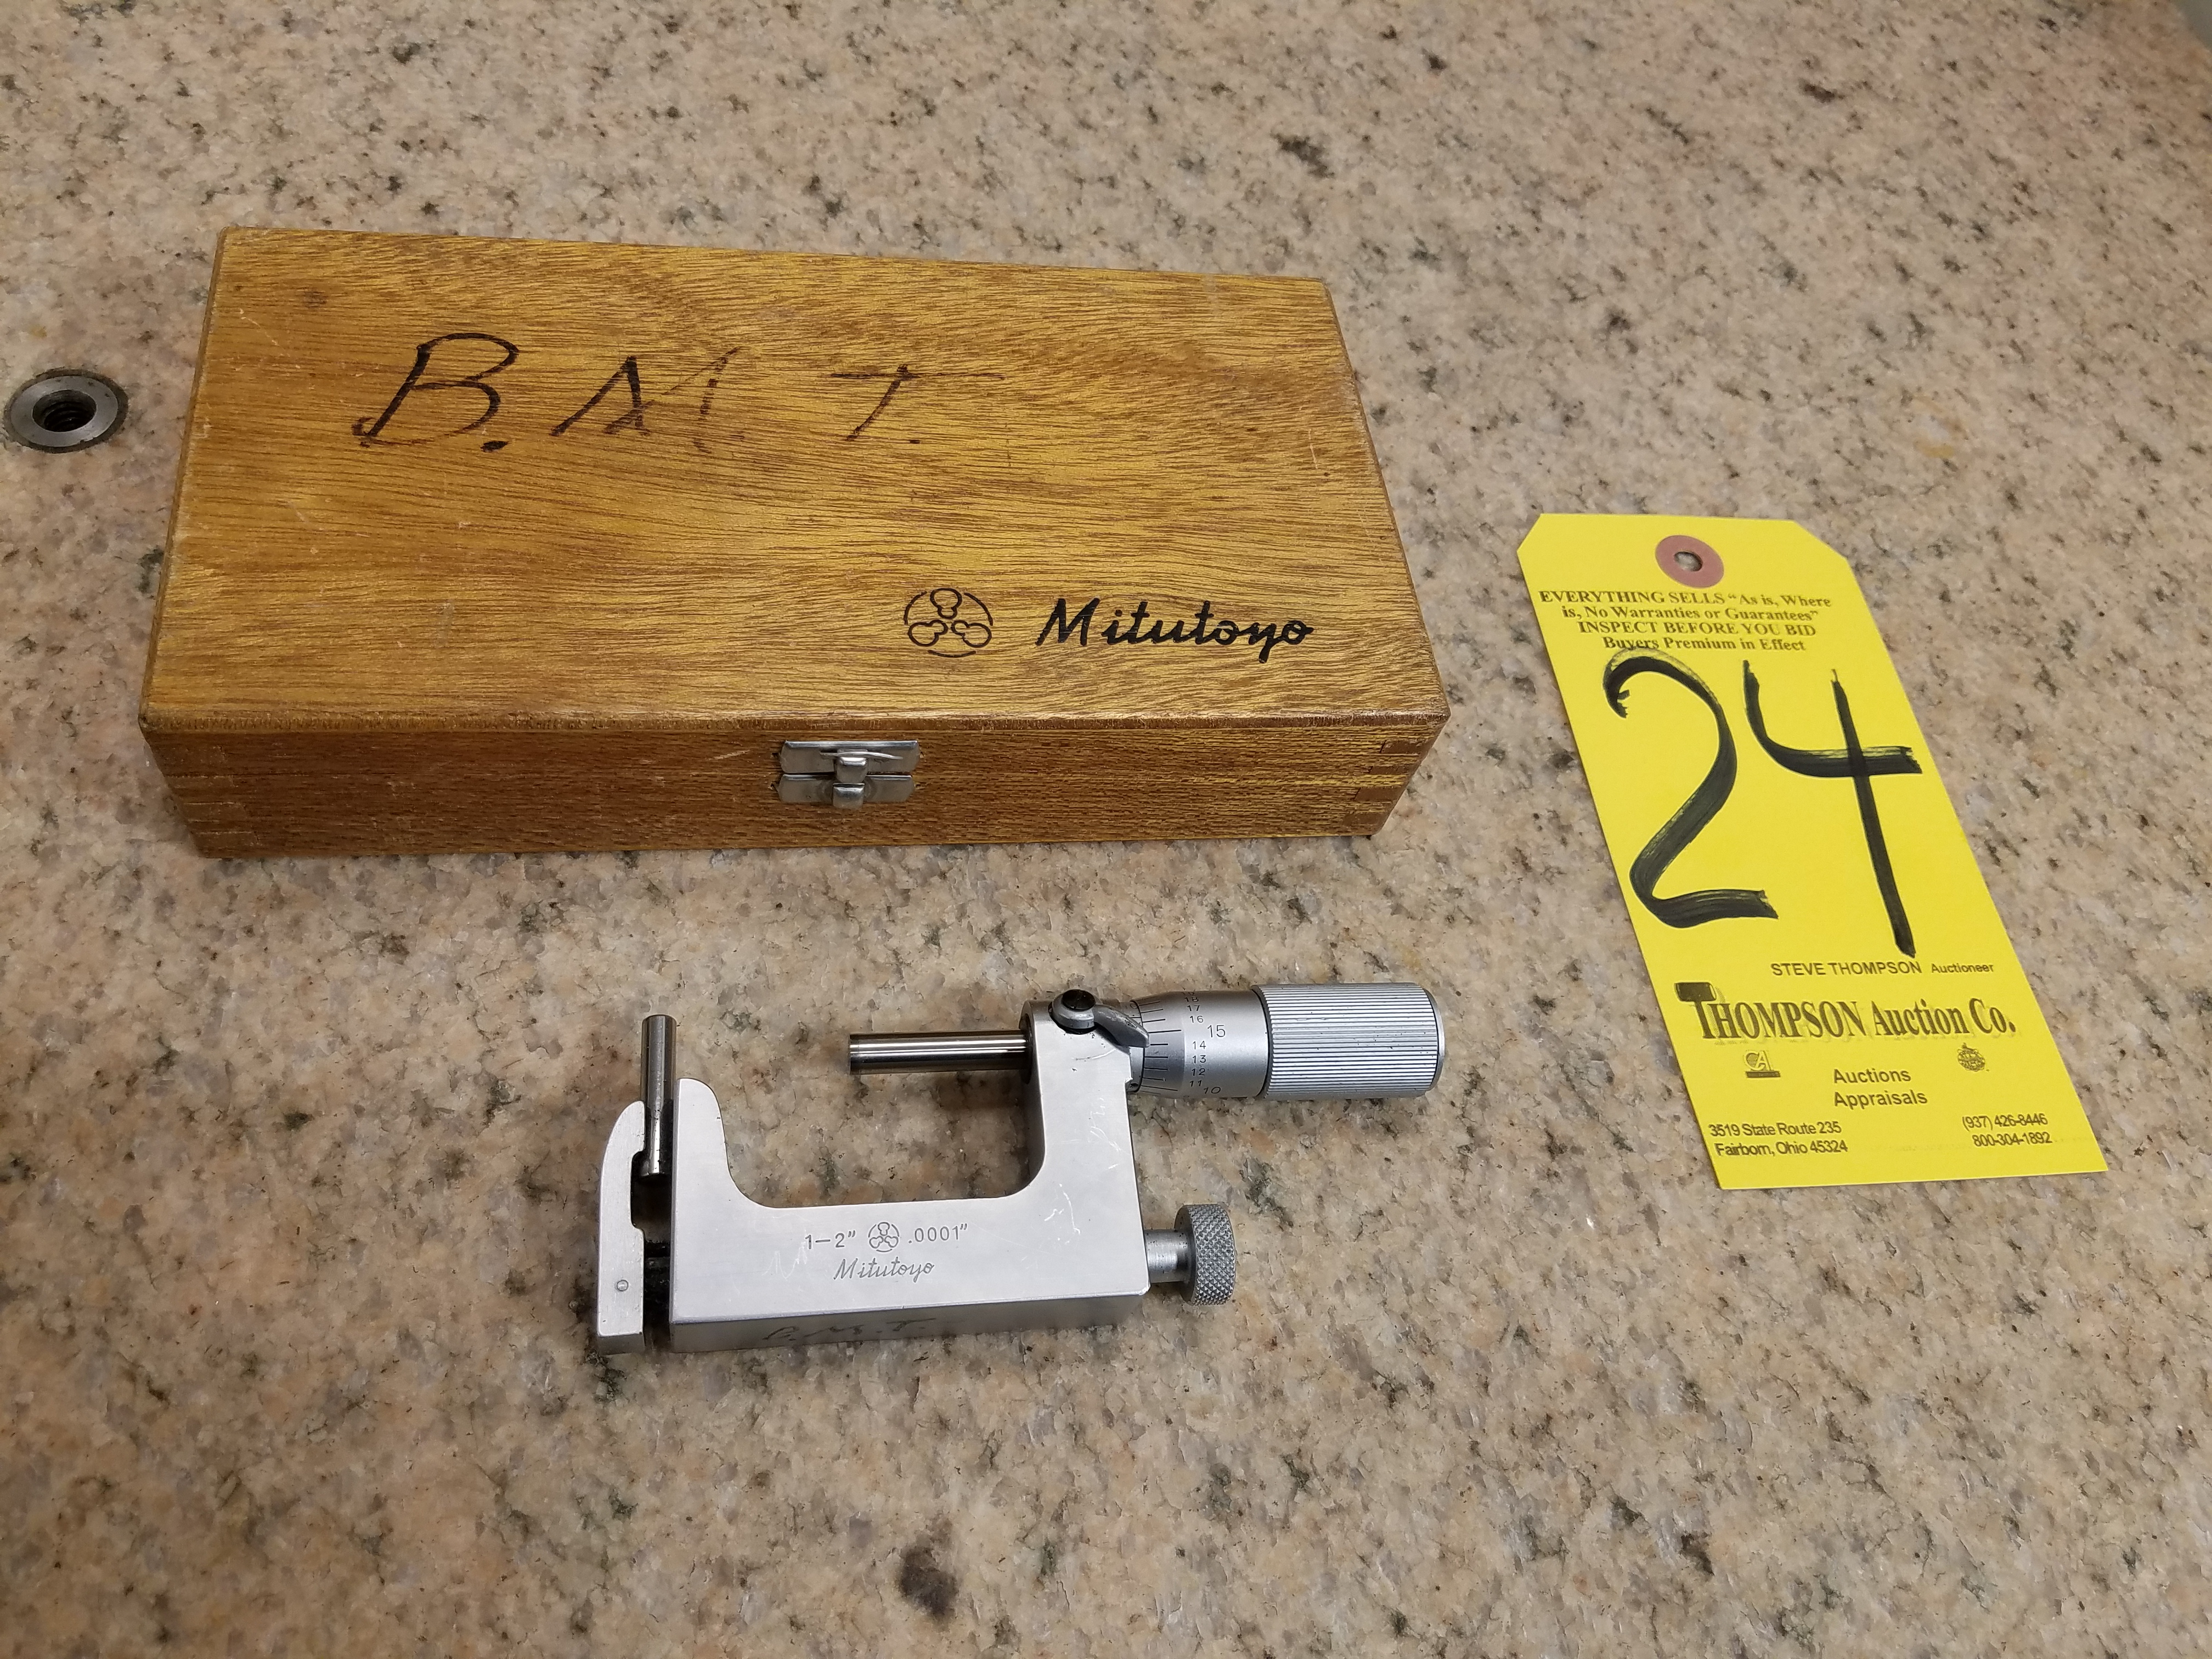 Lot 24 - Mitutoyo 1 In. -2 In. Uni-Mike Micrometer